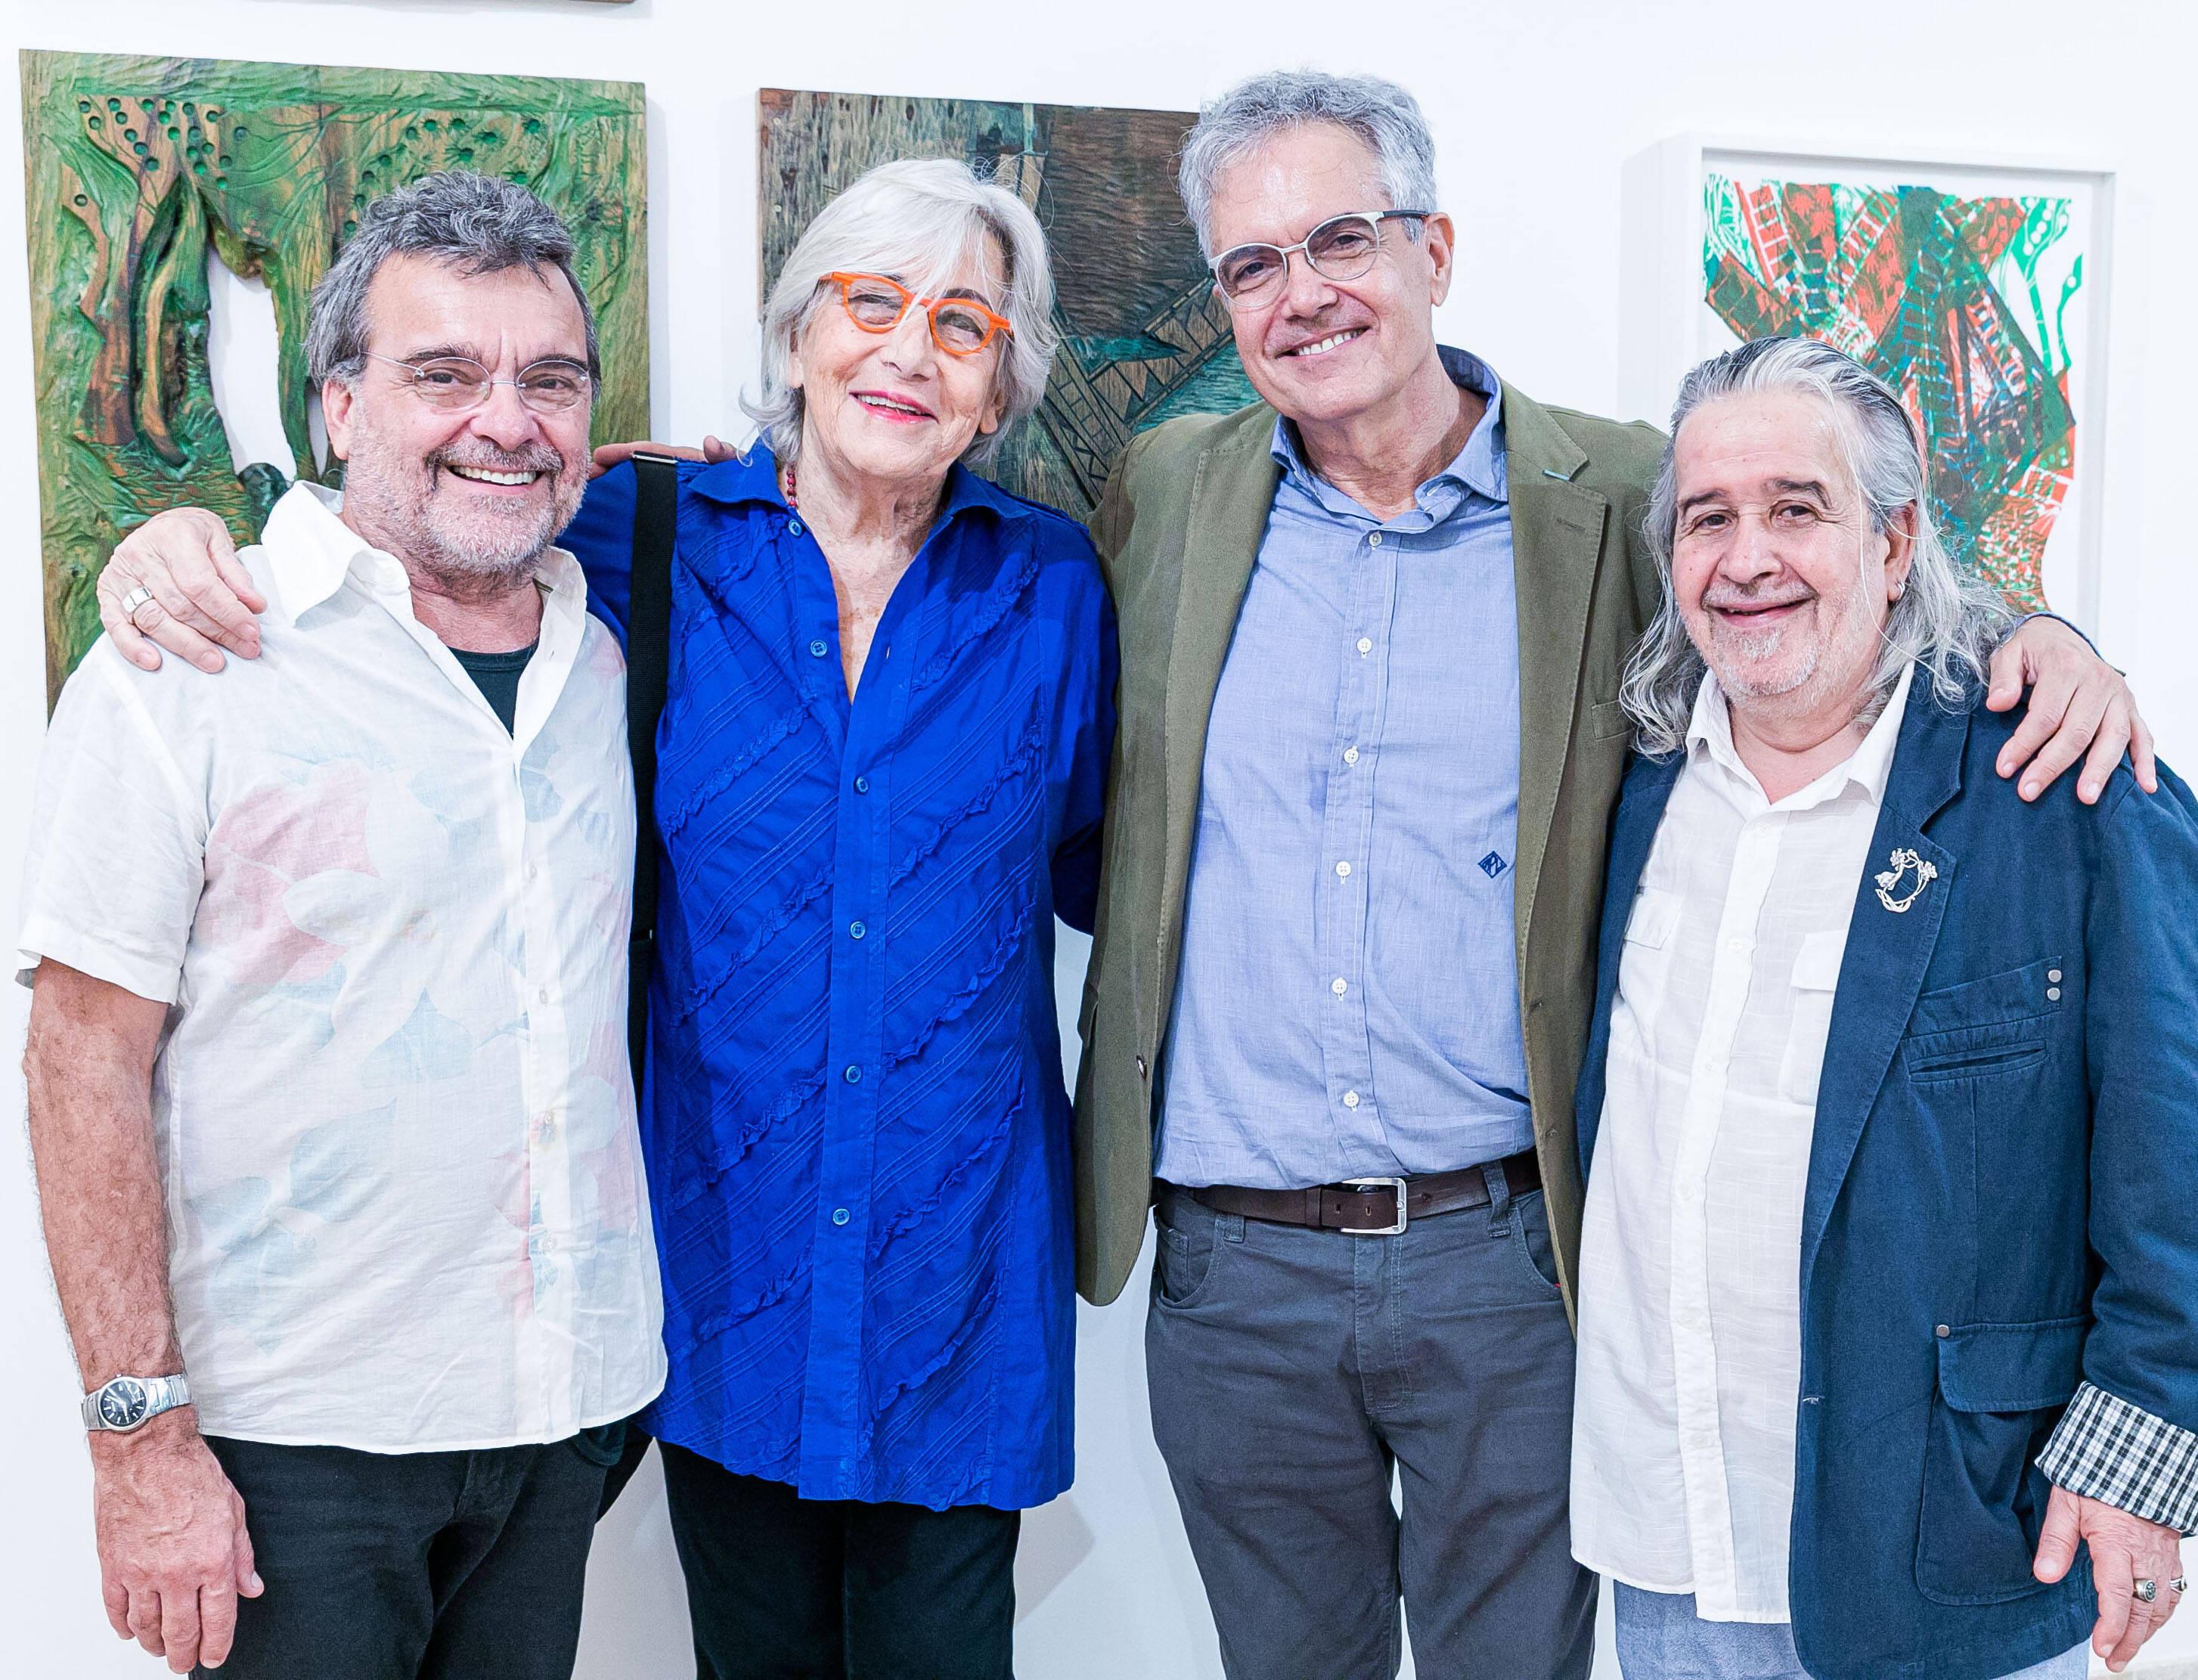 Antonio Mendel,  Maria Bonomi, Lauro Cavalcanti e Joel Coelho / Foto: Miguel Sá